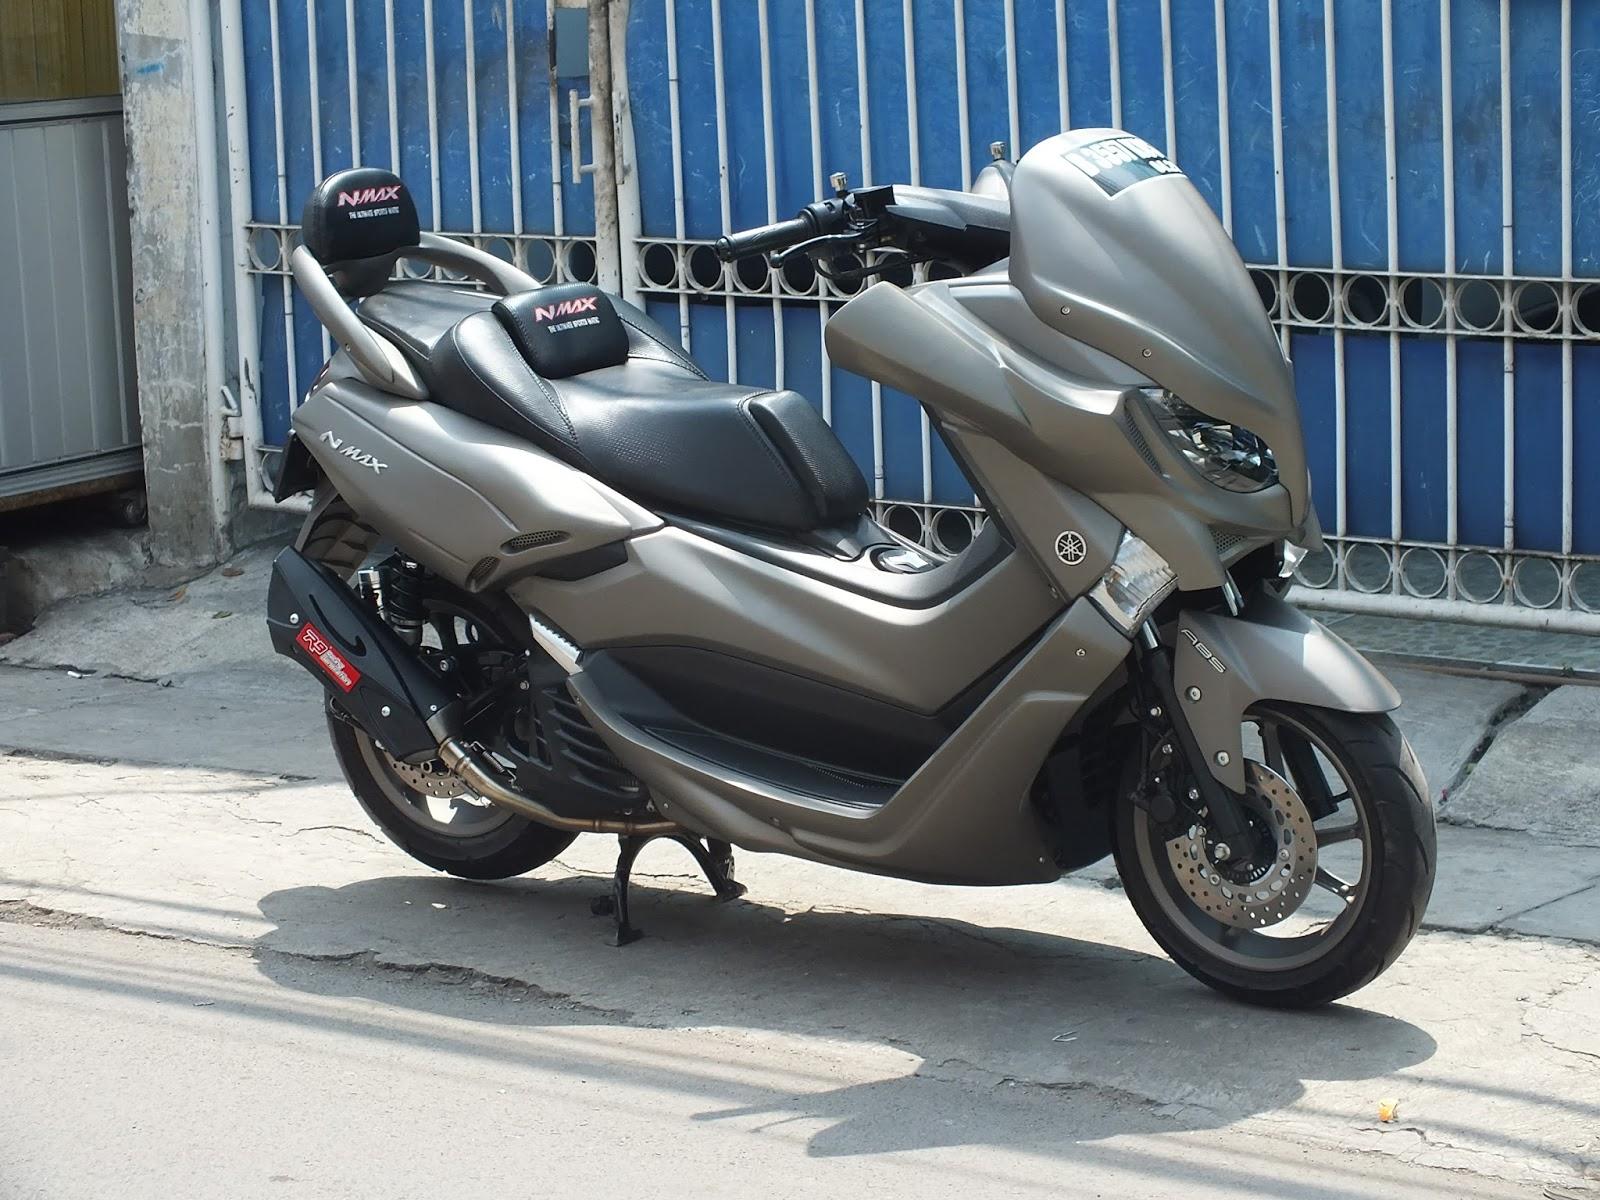 52 Harga Jok Modifikasi Yamaha Nmax